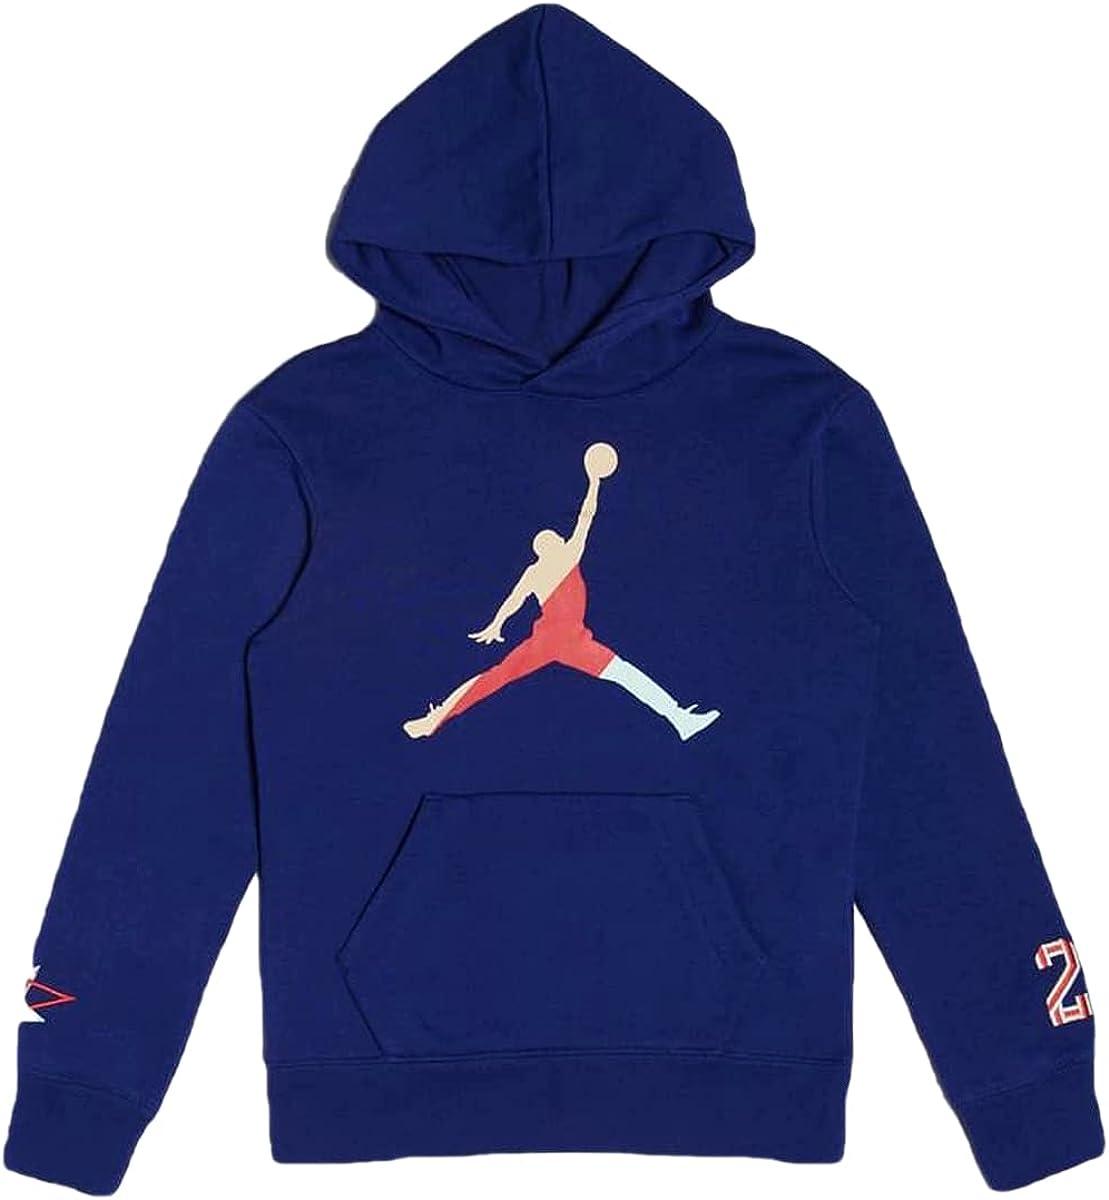 Nike Air Jordan Jumpman Finally Fashion resale start Big Hoodie Kids' Boys'